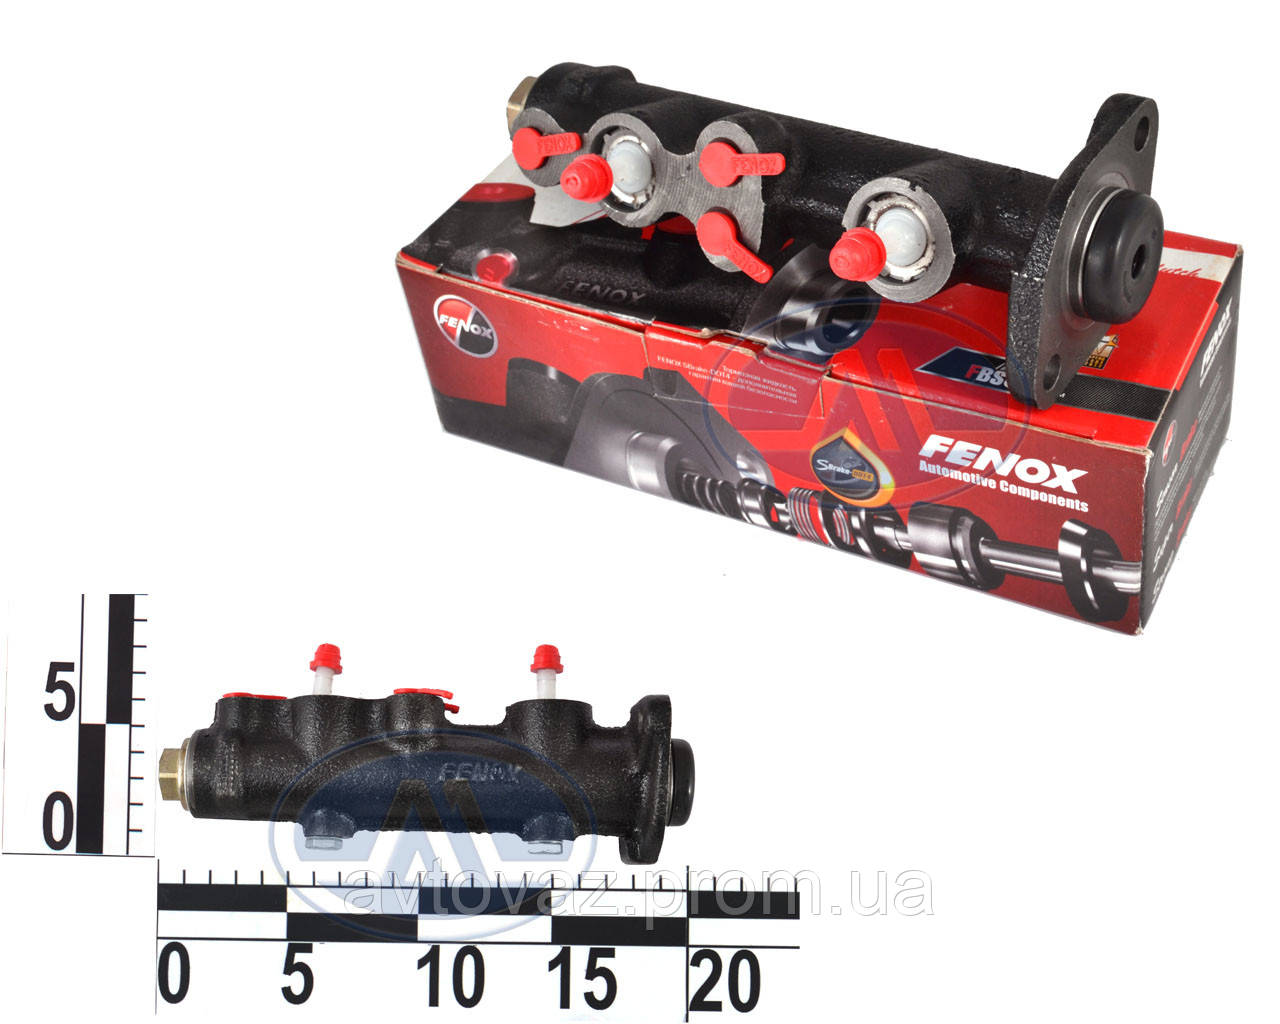 Цилиндр главный тормозной, ГТЦ, ВАЗ 2101, 2102, 2103, 2104, 2105, 2106, 2107 Fenox